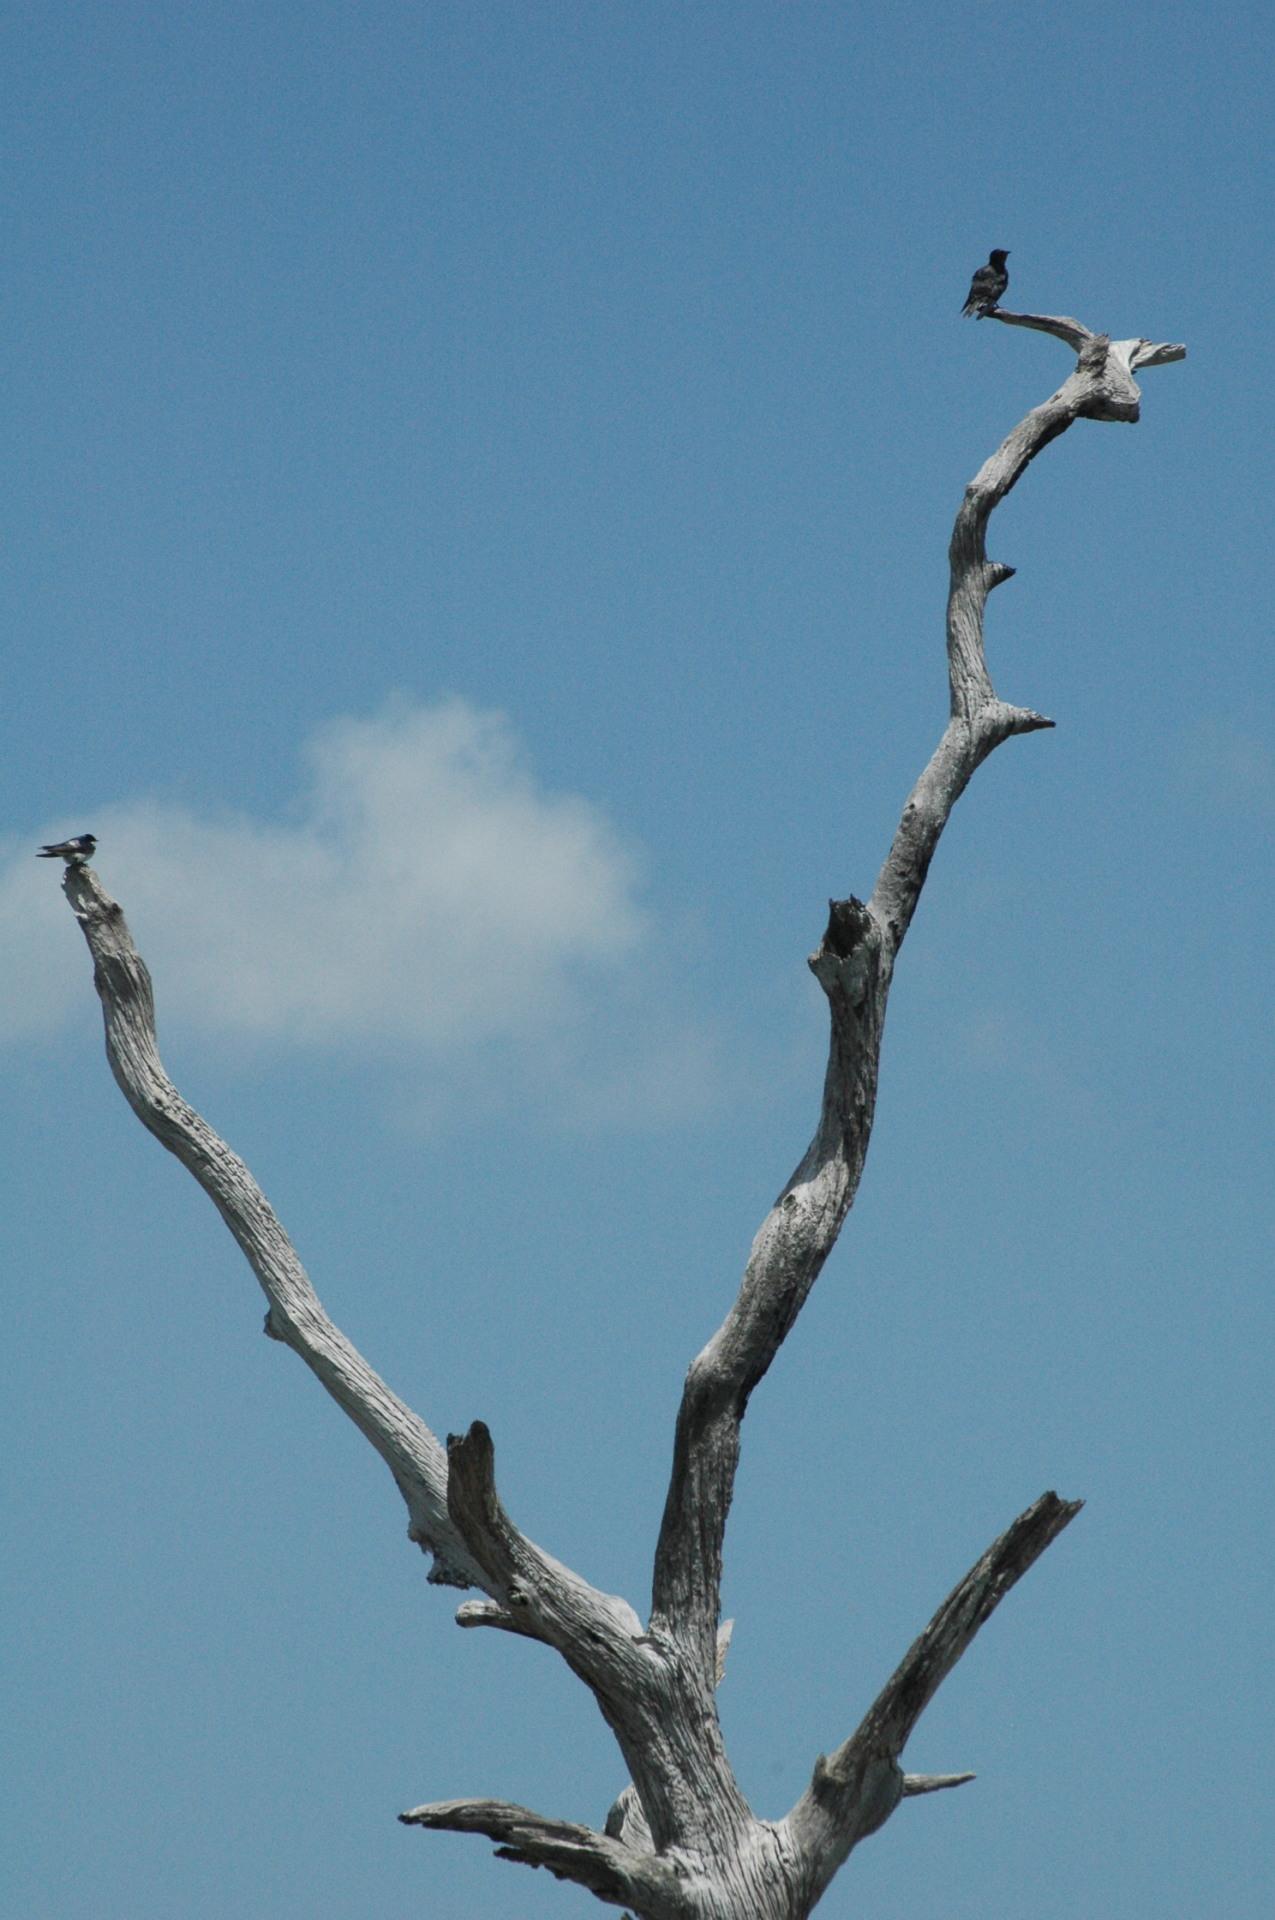 Green Cay barren tree